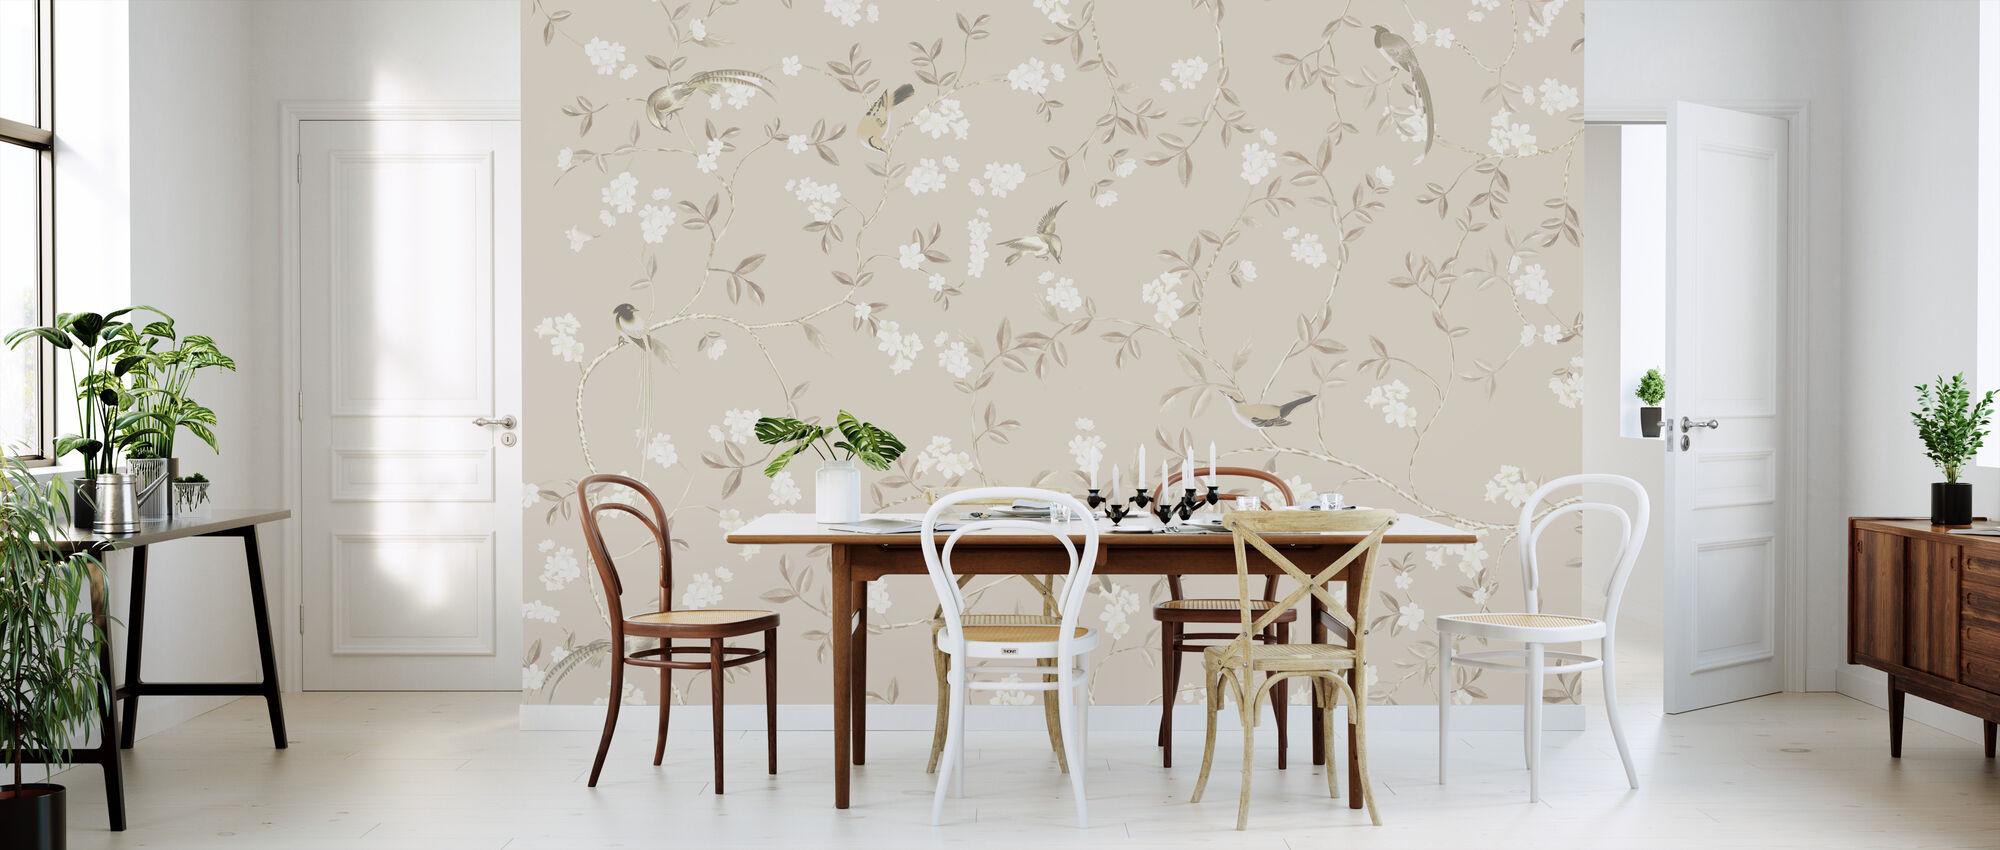 Birds and Flowers - Cream - Wallpaper - Kitchen